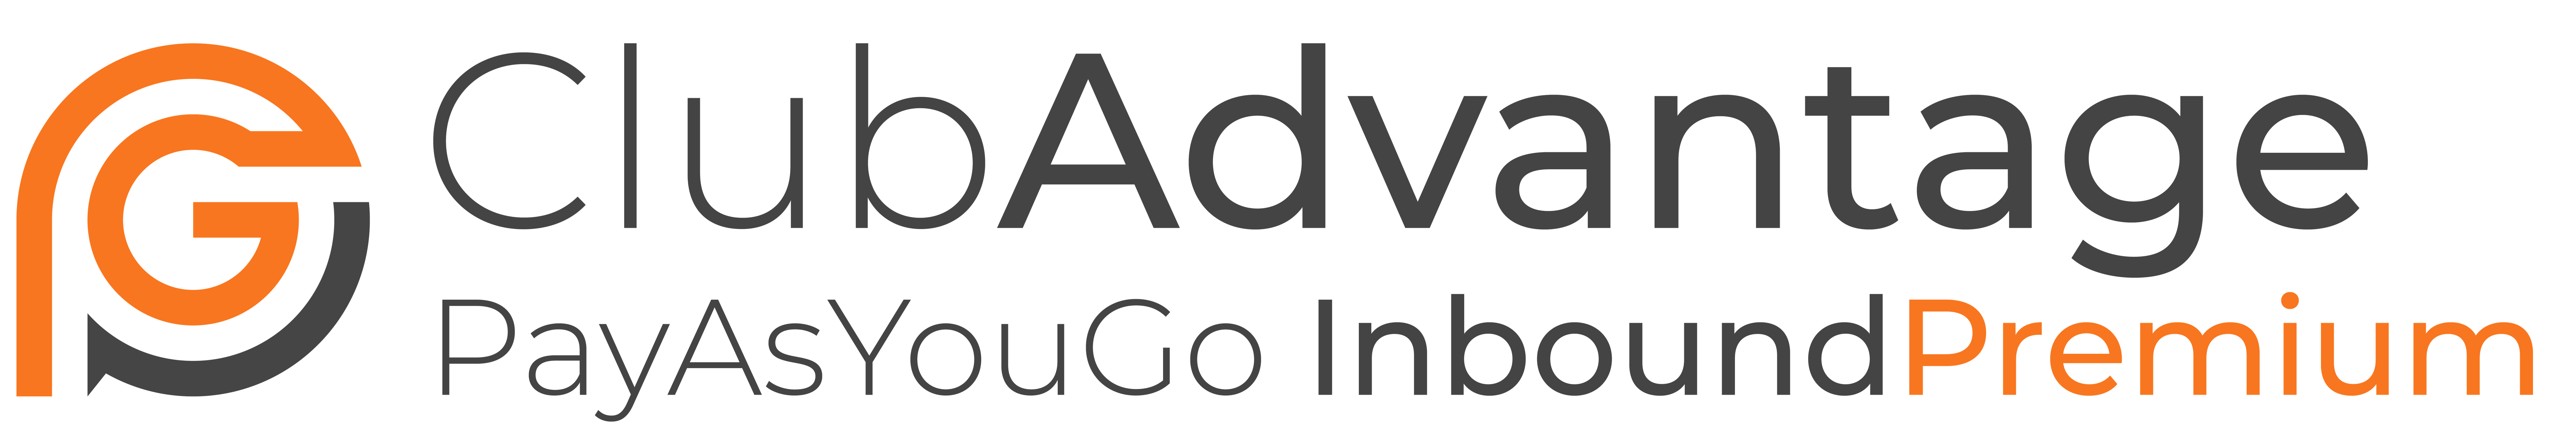 ClubAdvantage Logo - Premium